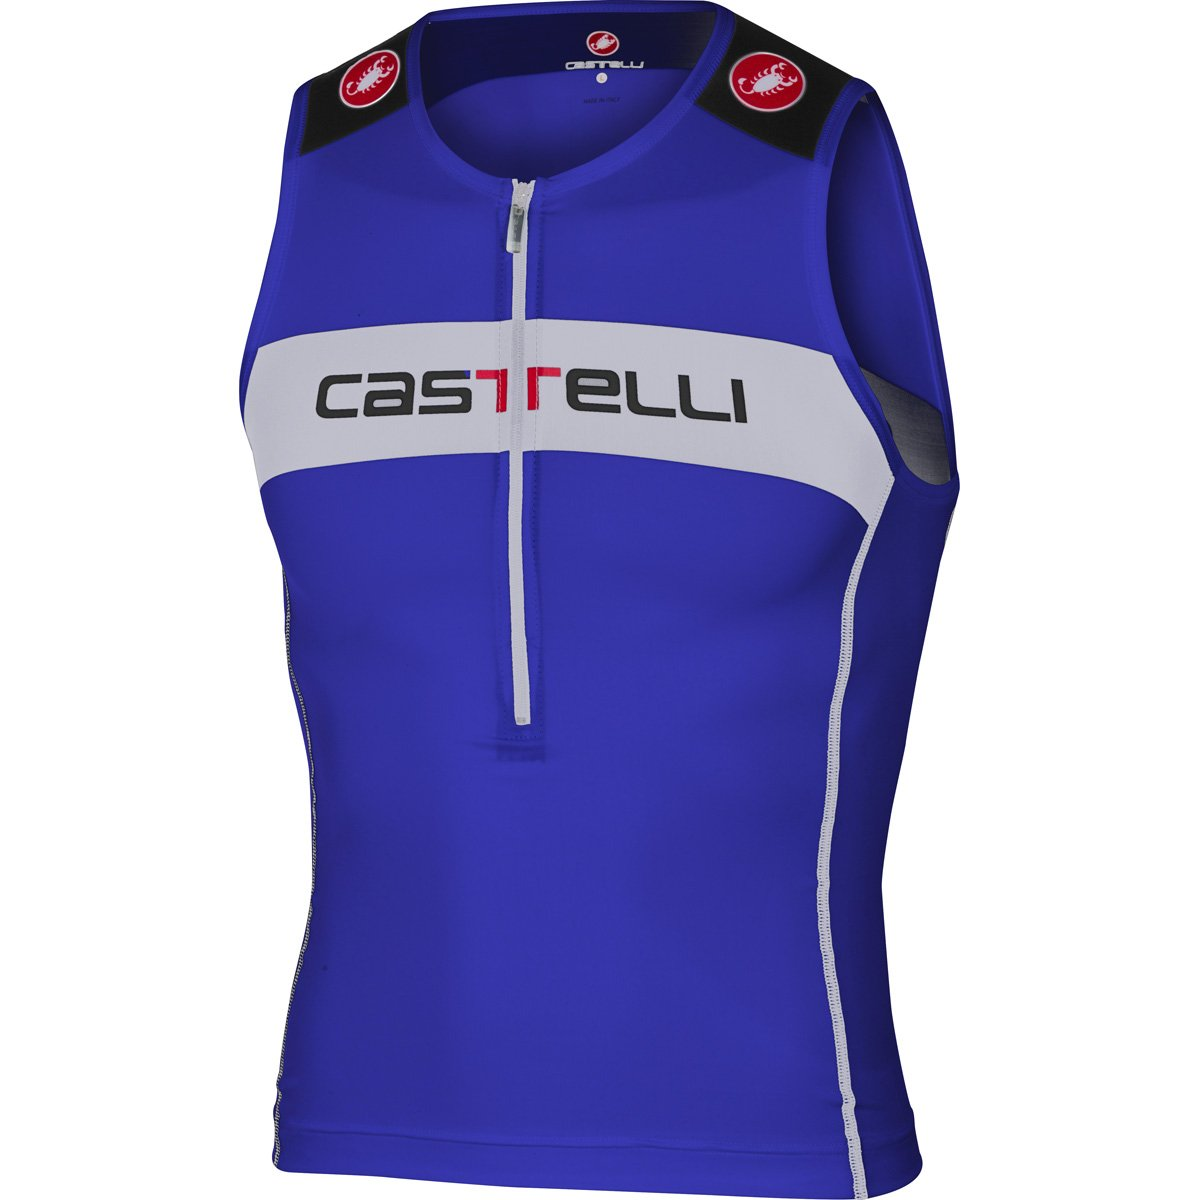 Castelli Core Tri Top – Men 's Small Surf Blue/White B06X91KQFB